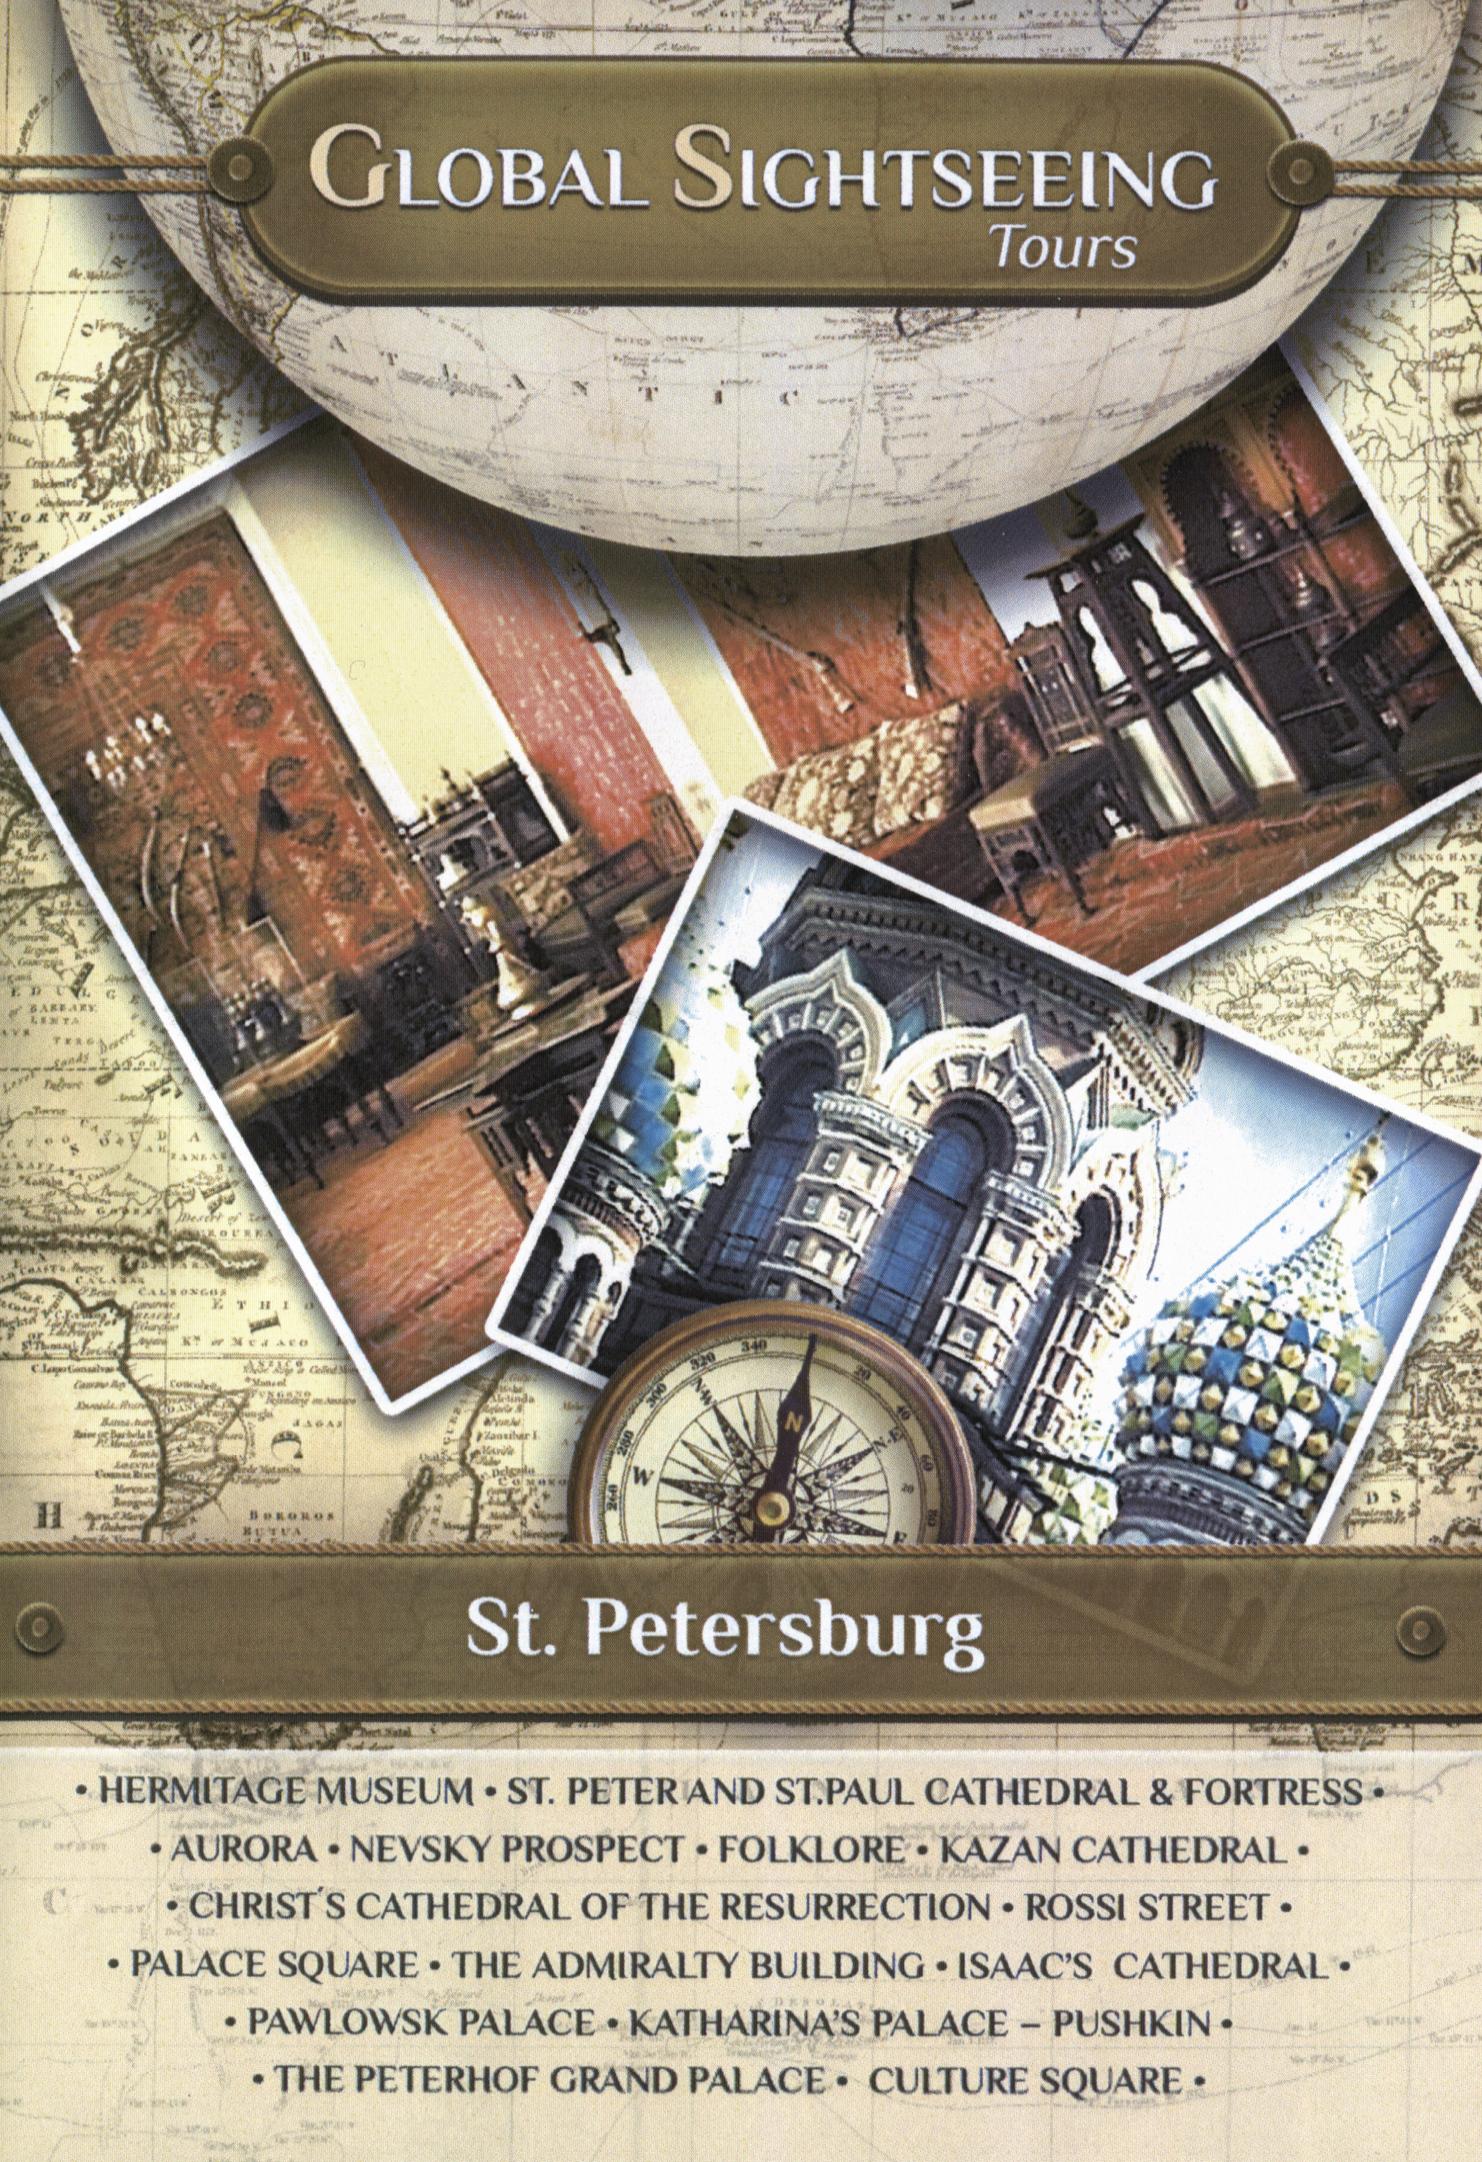 Global Sightseeing Tours: St. Petersburg